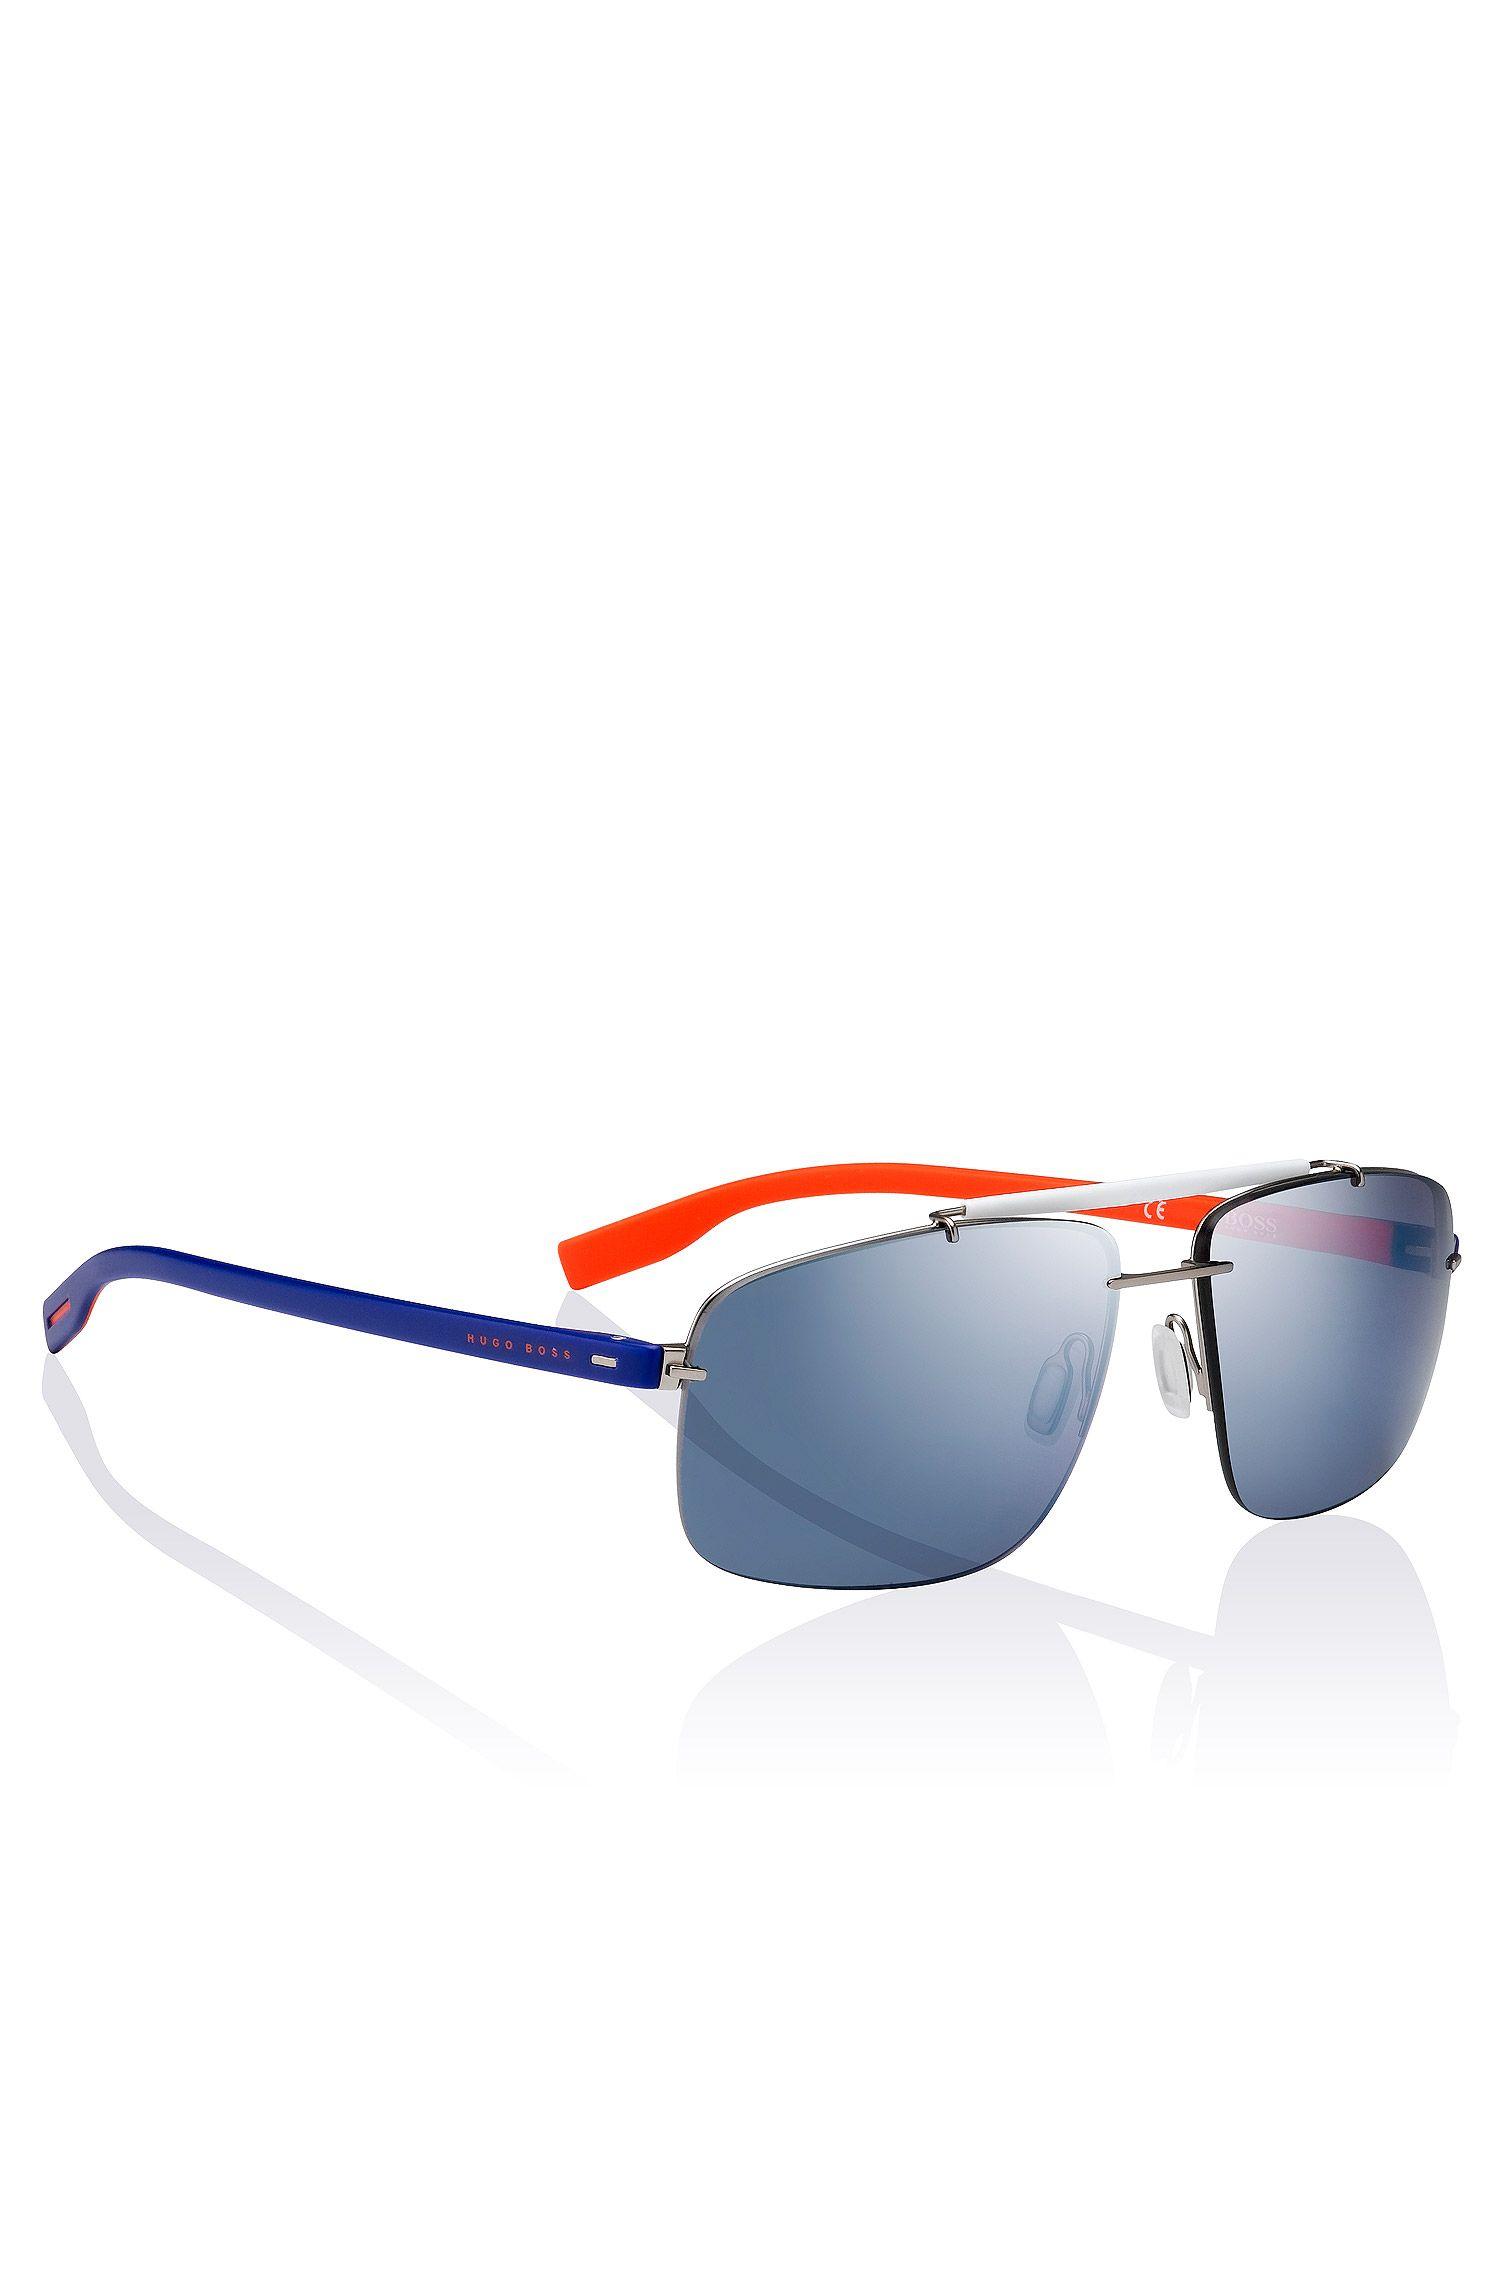 Sonnenbrille ´BOSS 0608/S`, Länderkollektion